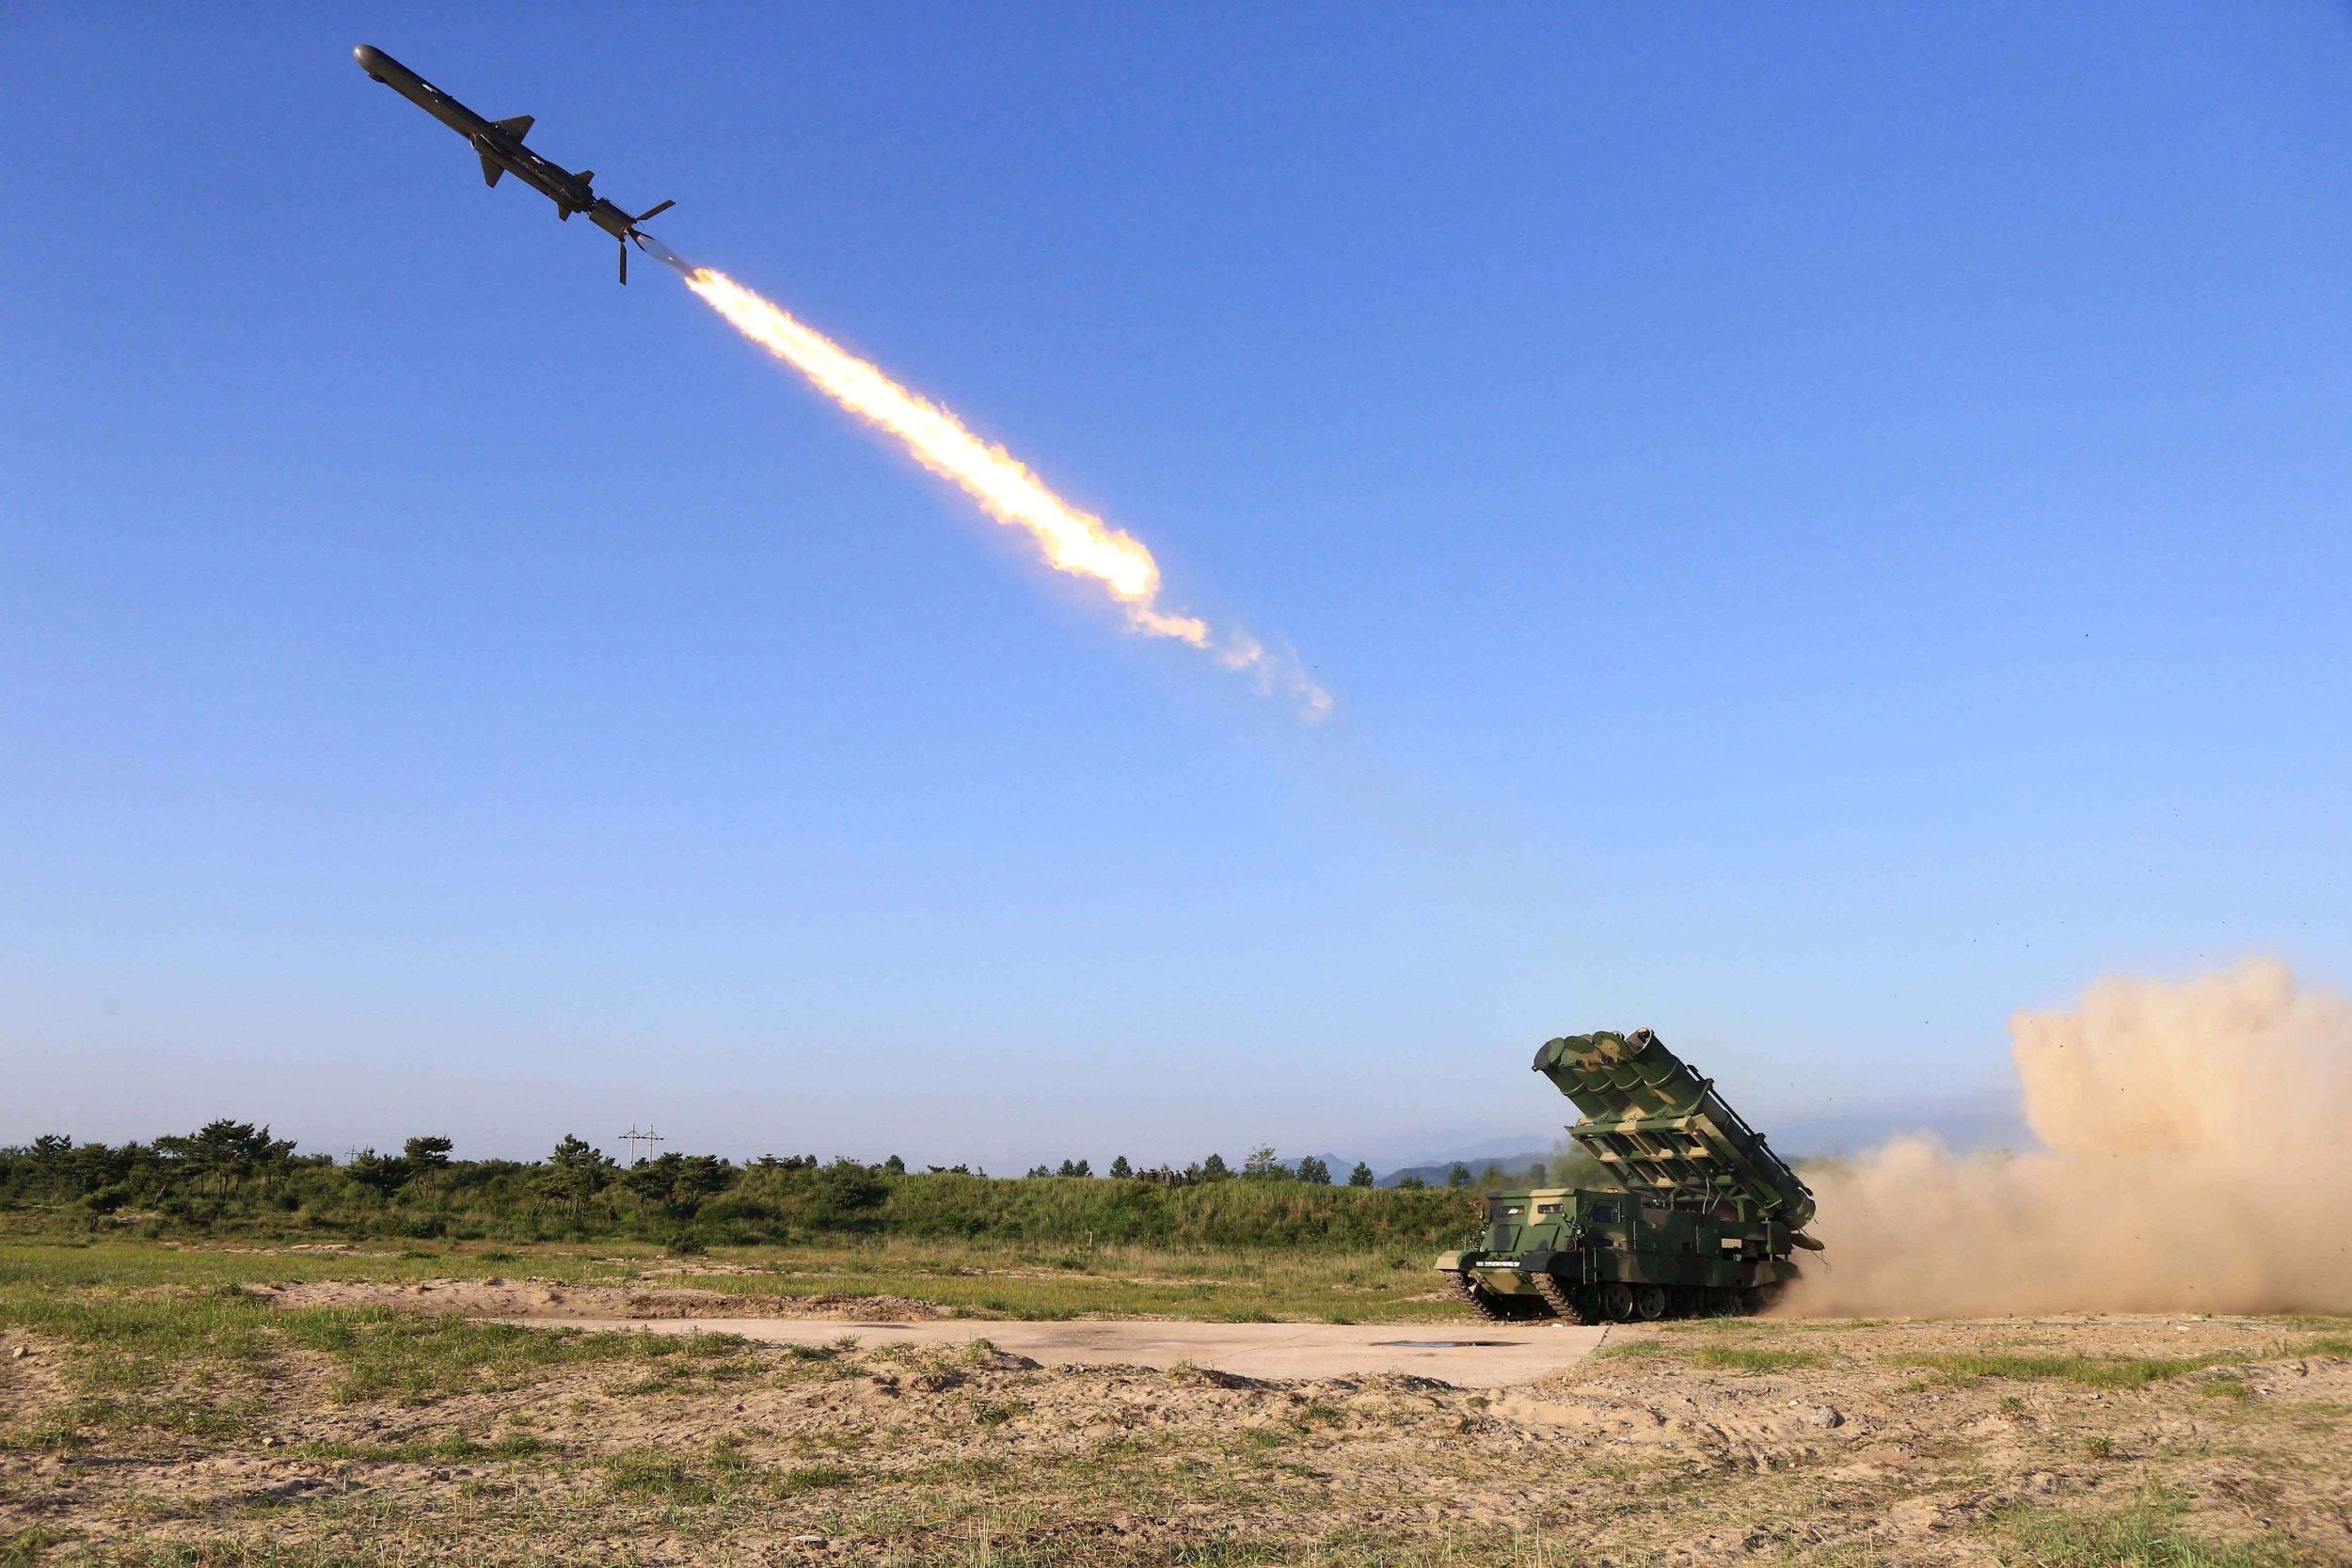 A cruise rocket launch